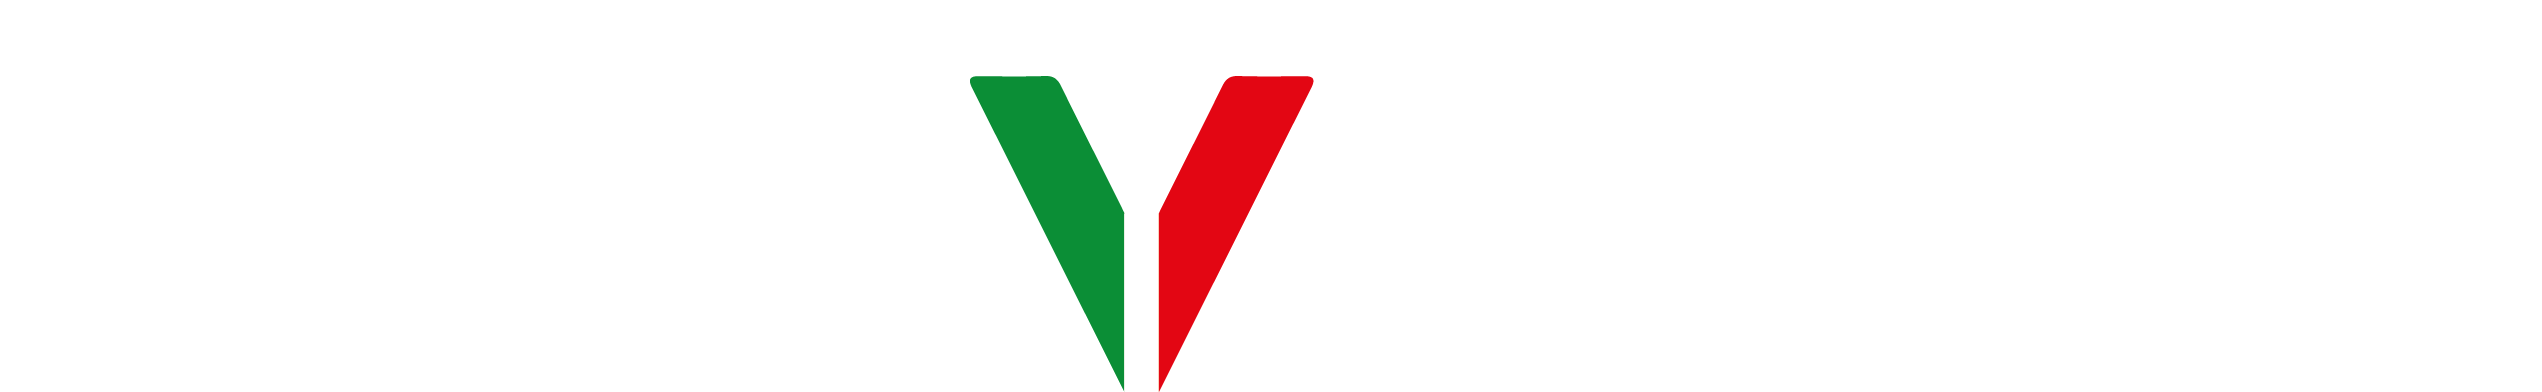 Innovabox